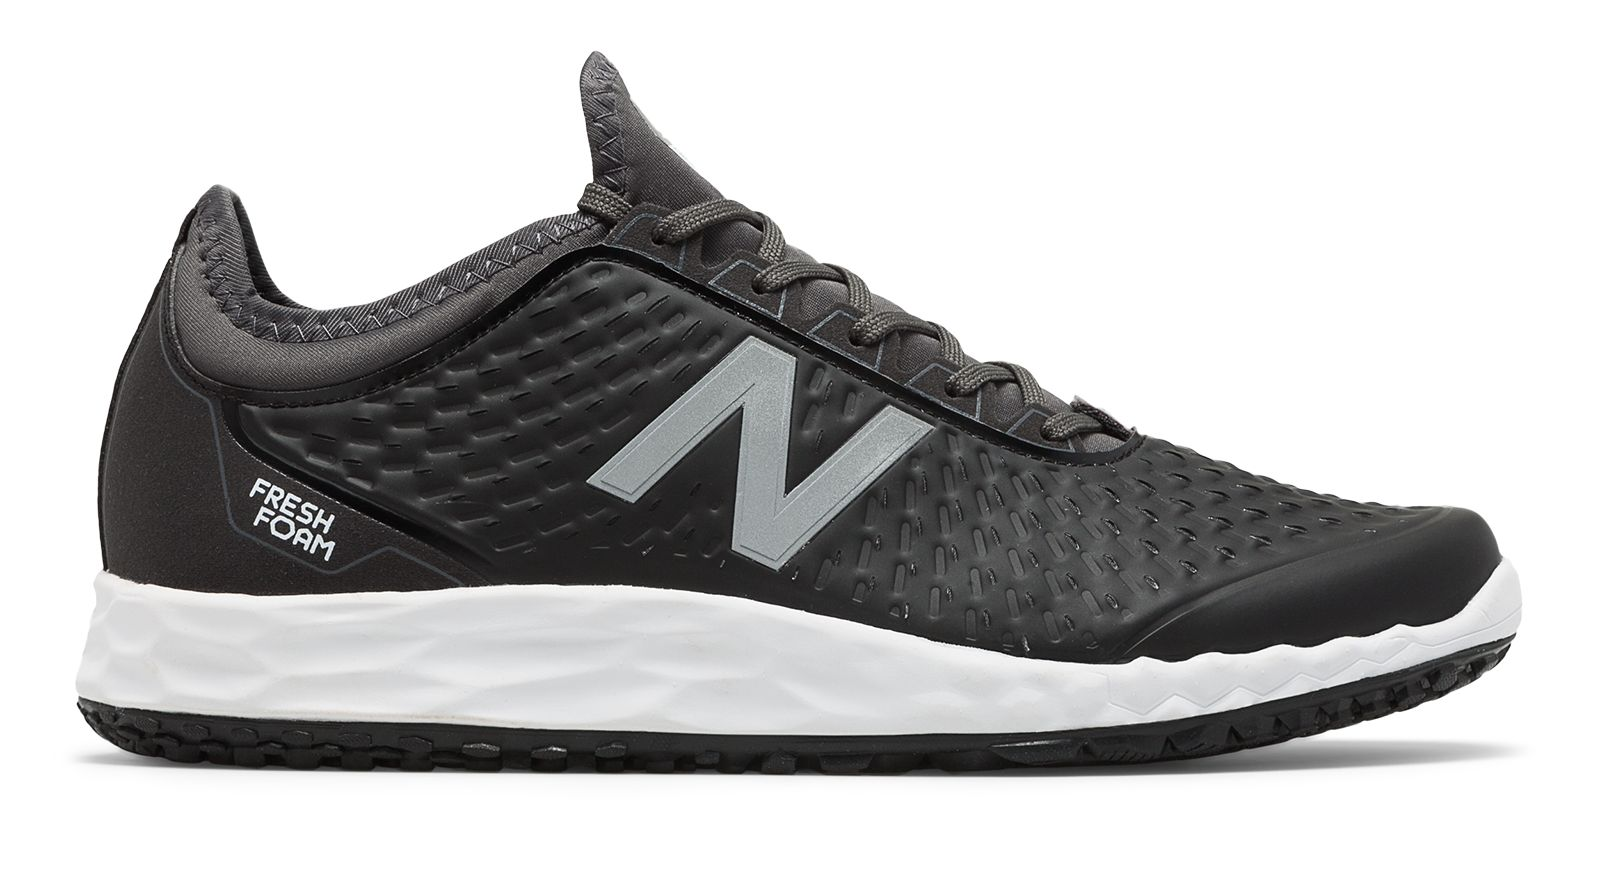 477f1710d New Balance Male Men s Fresh Foam Vaadu Comfort Adult Black With ...